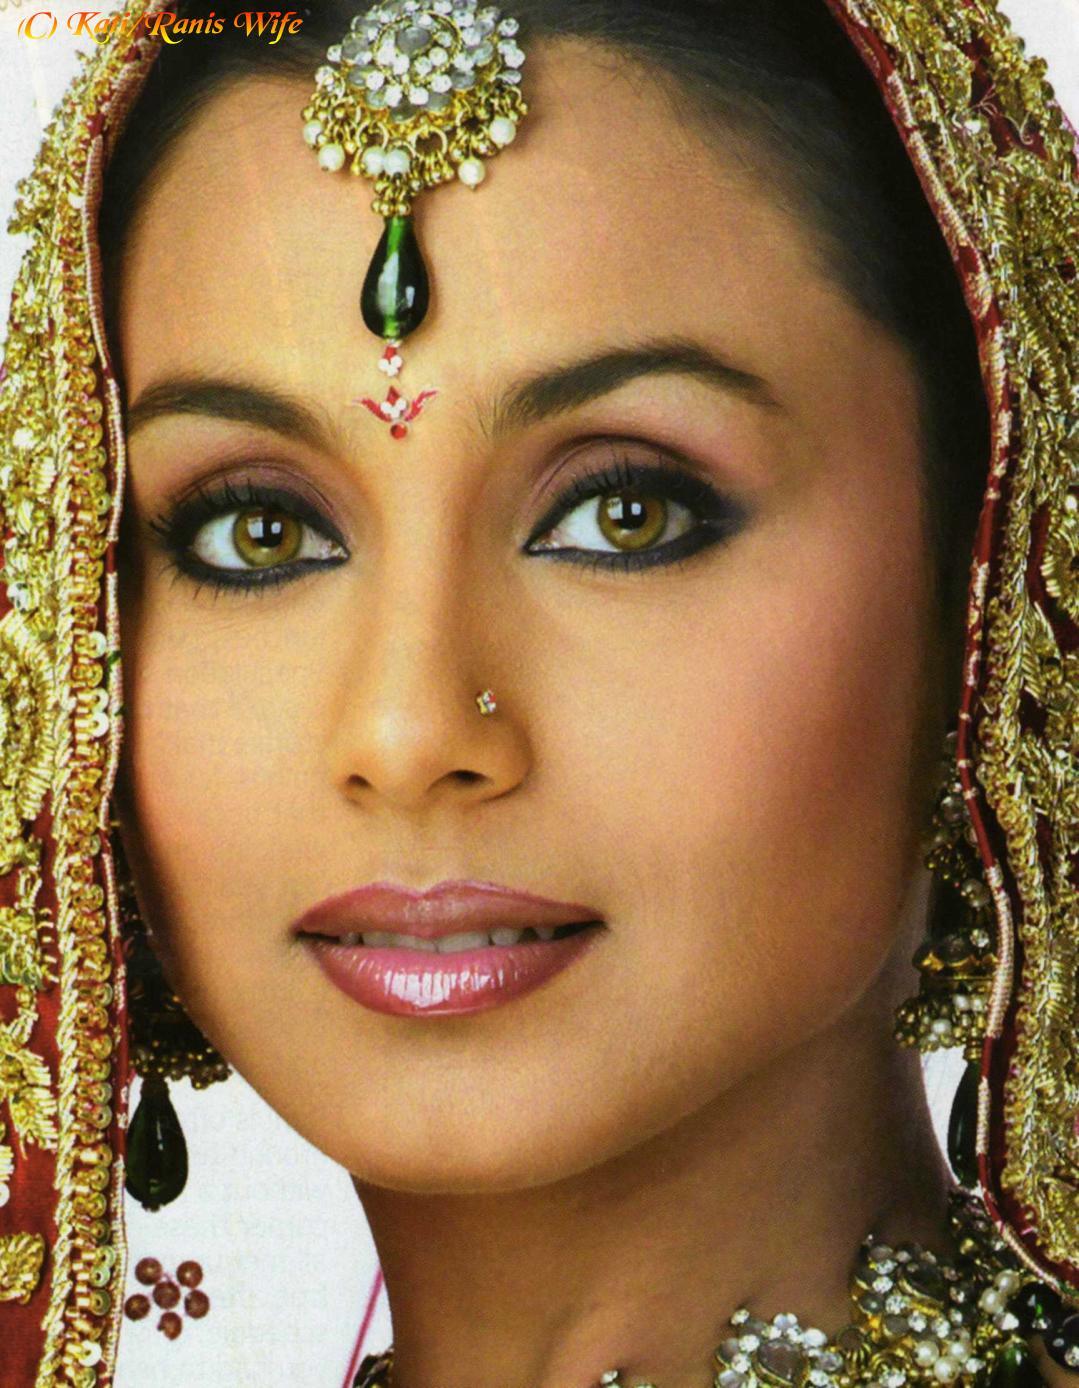 http://www.geourdu.com/wp-content/uploads/2011/07/Rani-Mukerji-02.jpg